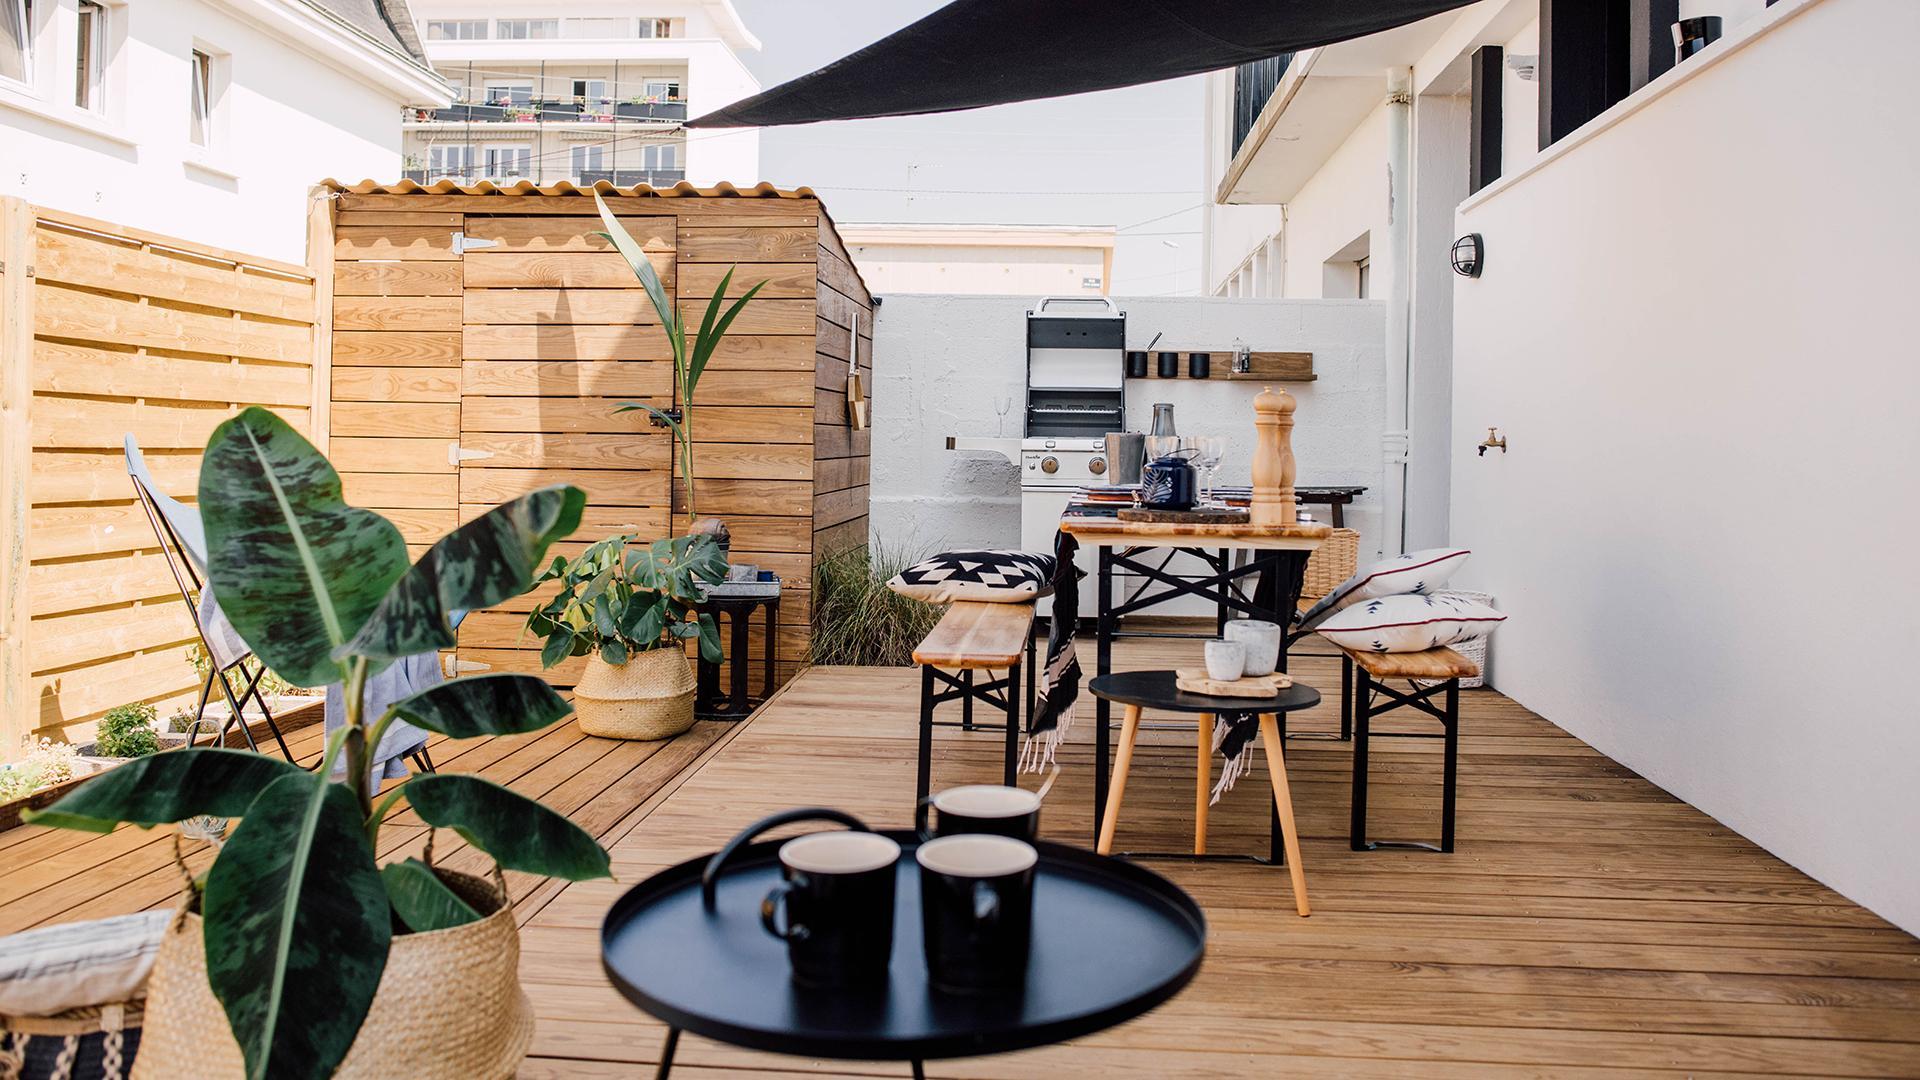 Nettoyer et traiter une terrasse en bois : nos 5 conseils